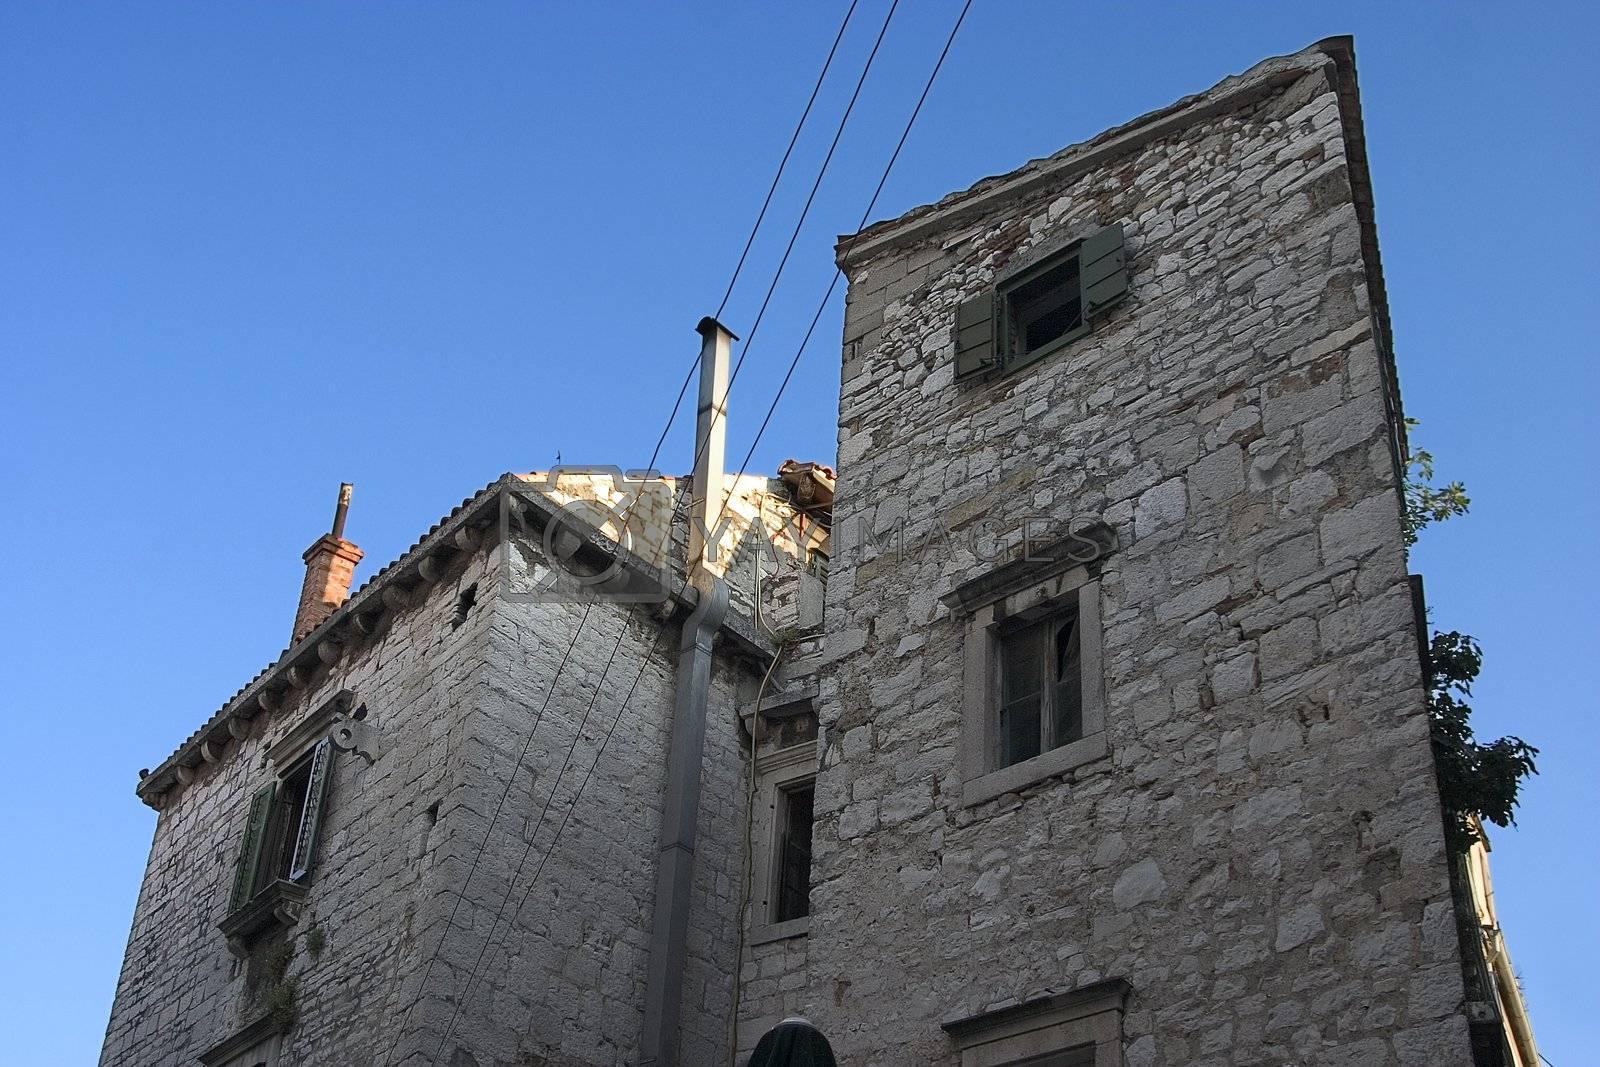 the beauty of Croatia die Sch�nheit von Kroatien